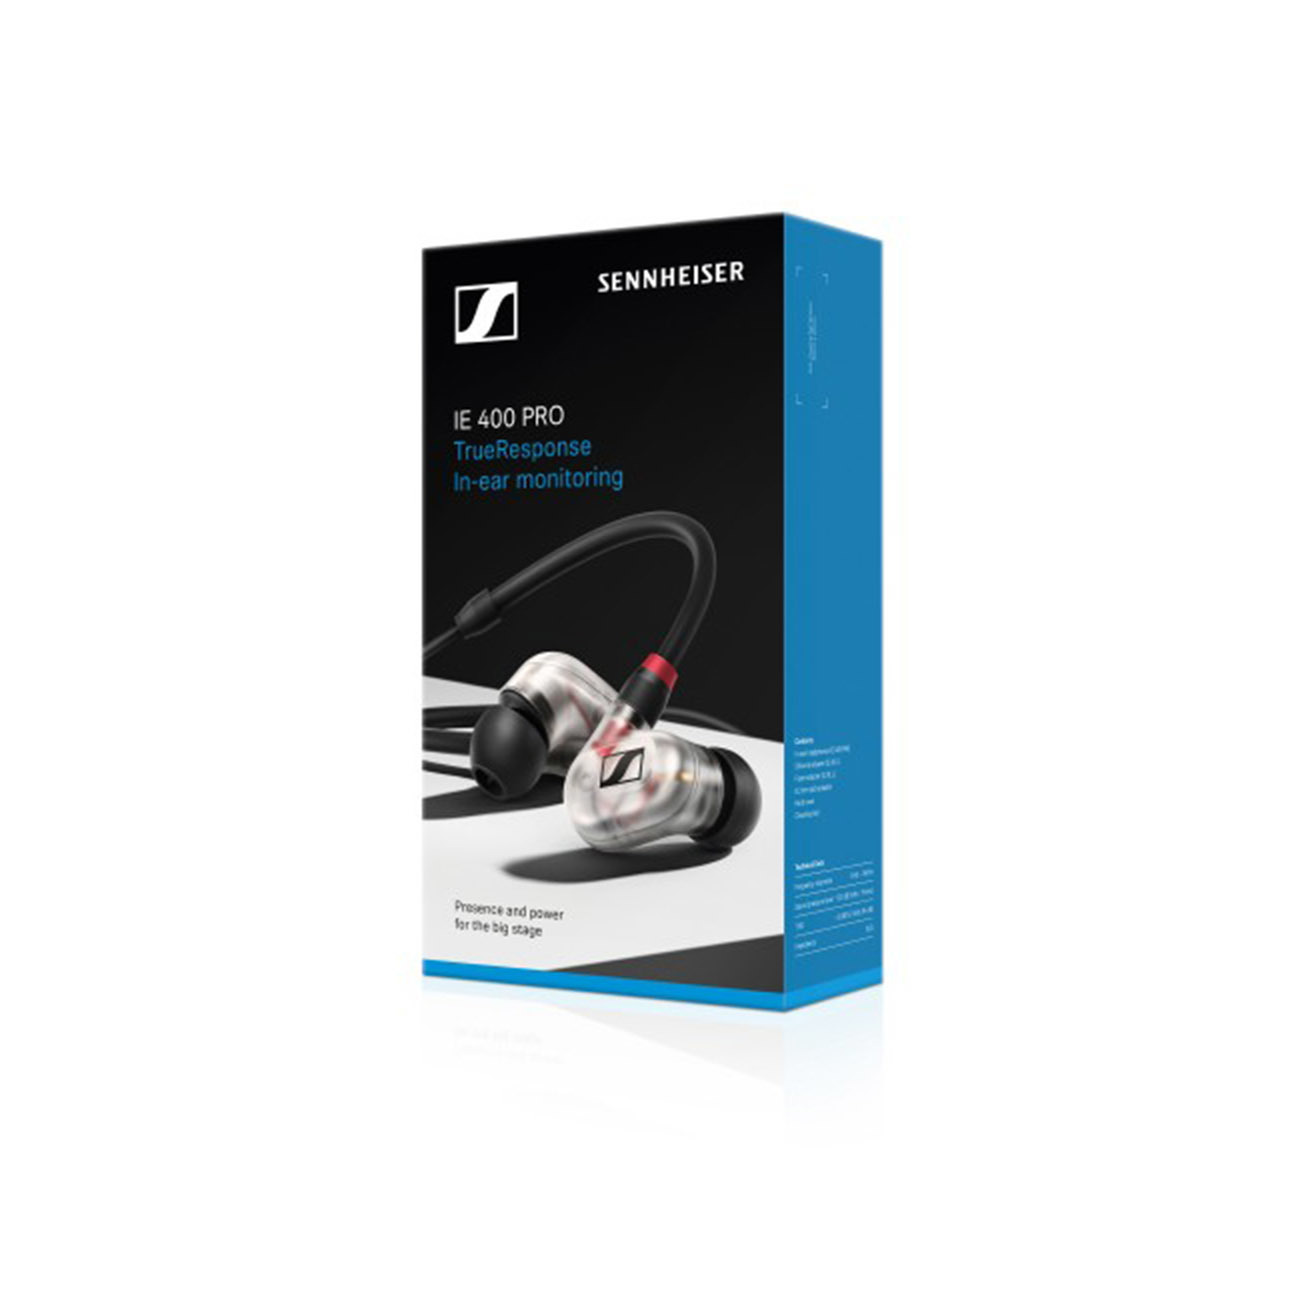 Sennheiser IE 400 Pro